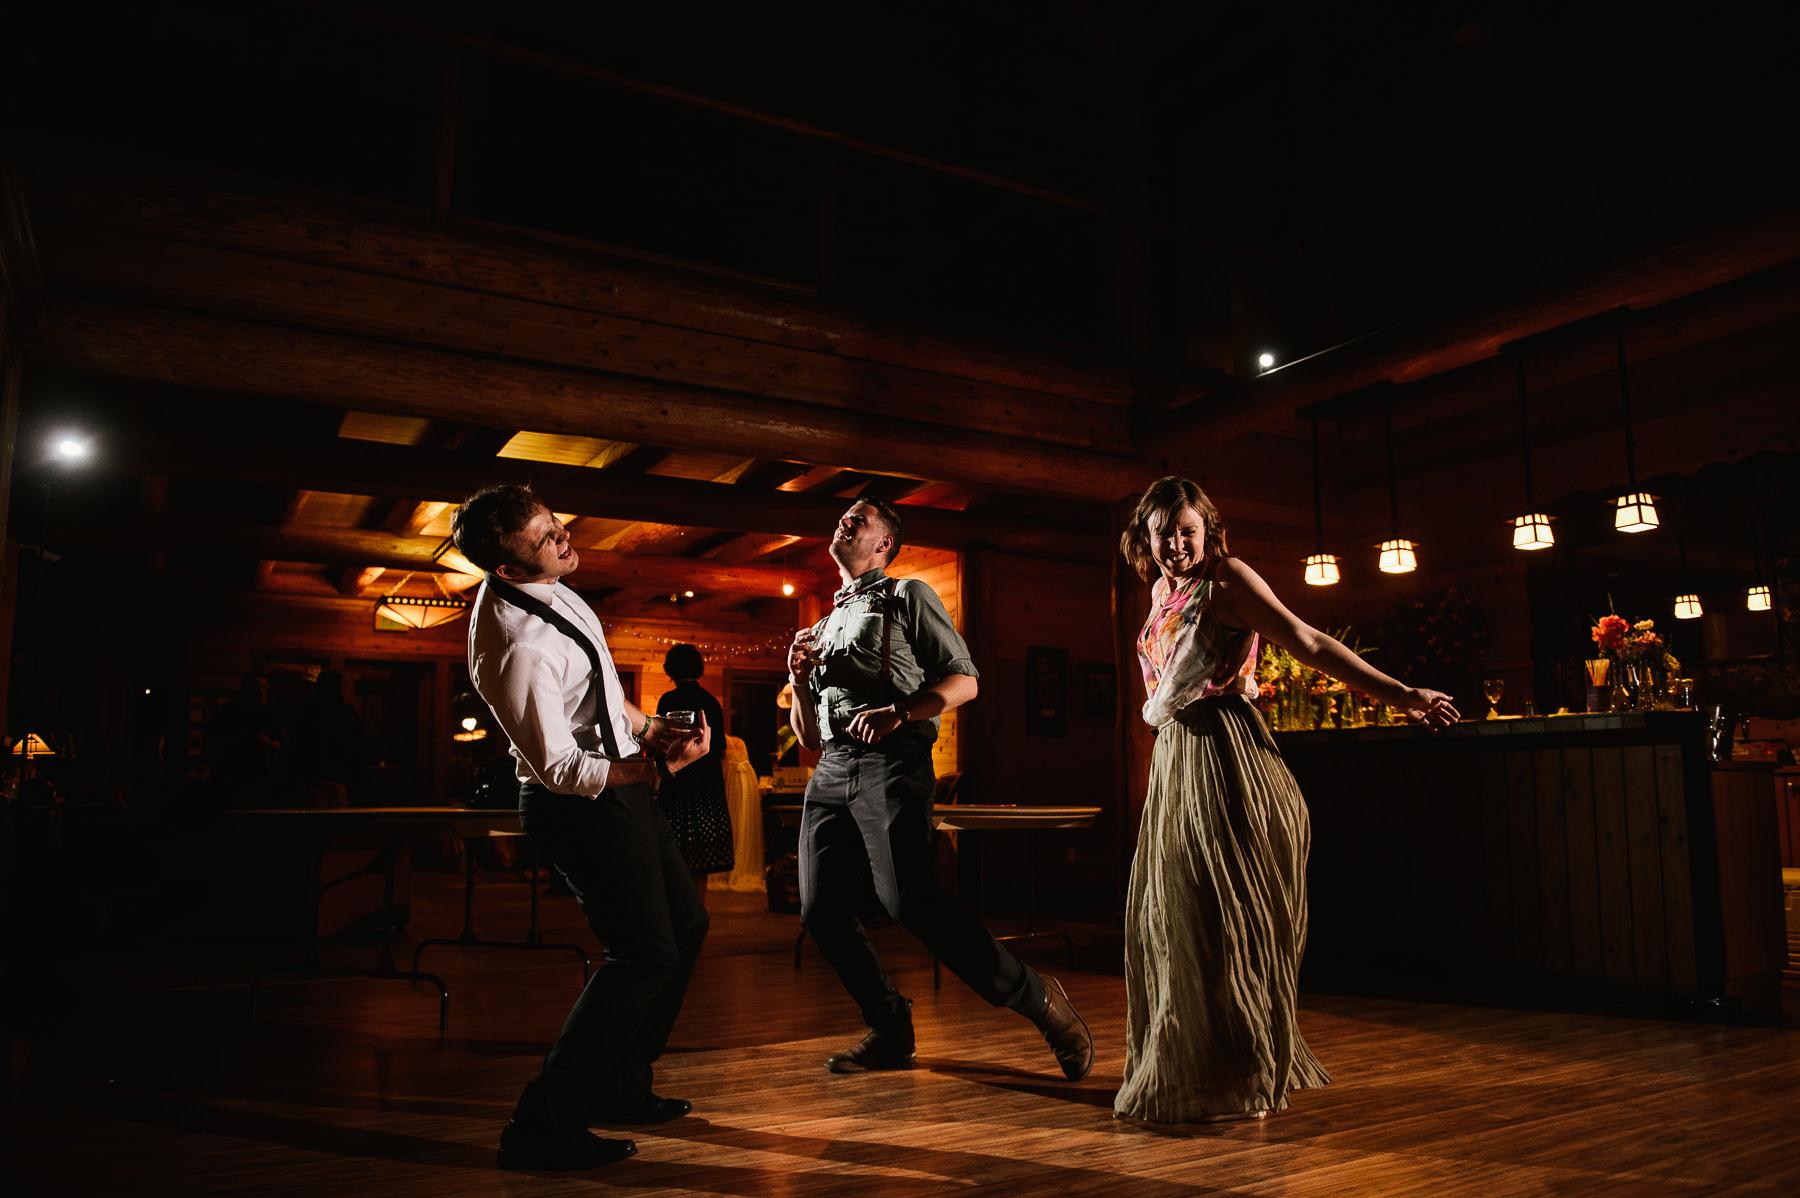 lake dale resort wedding dance floor